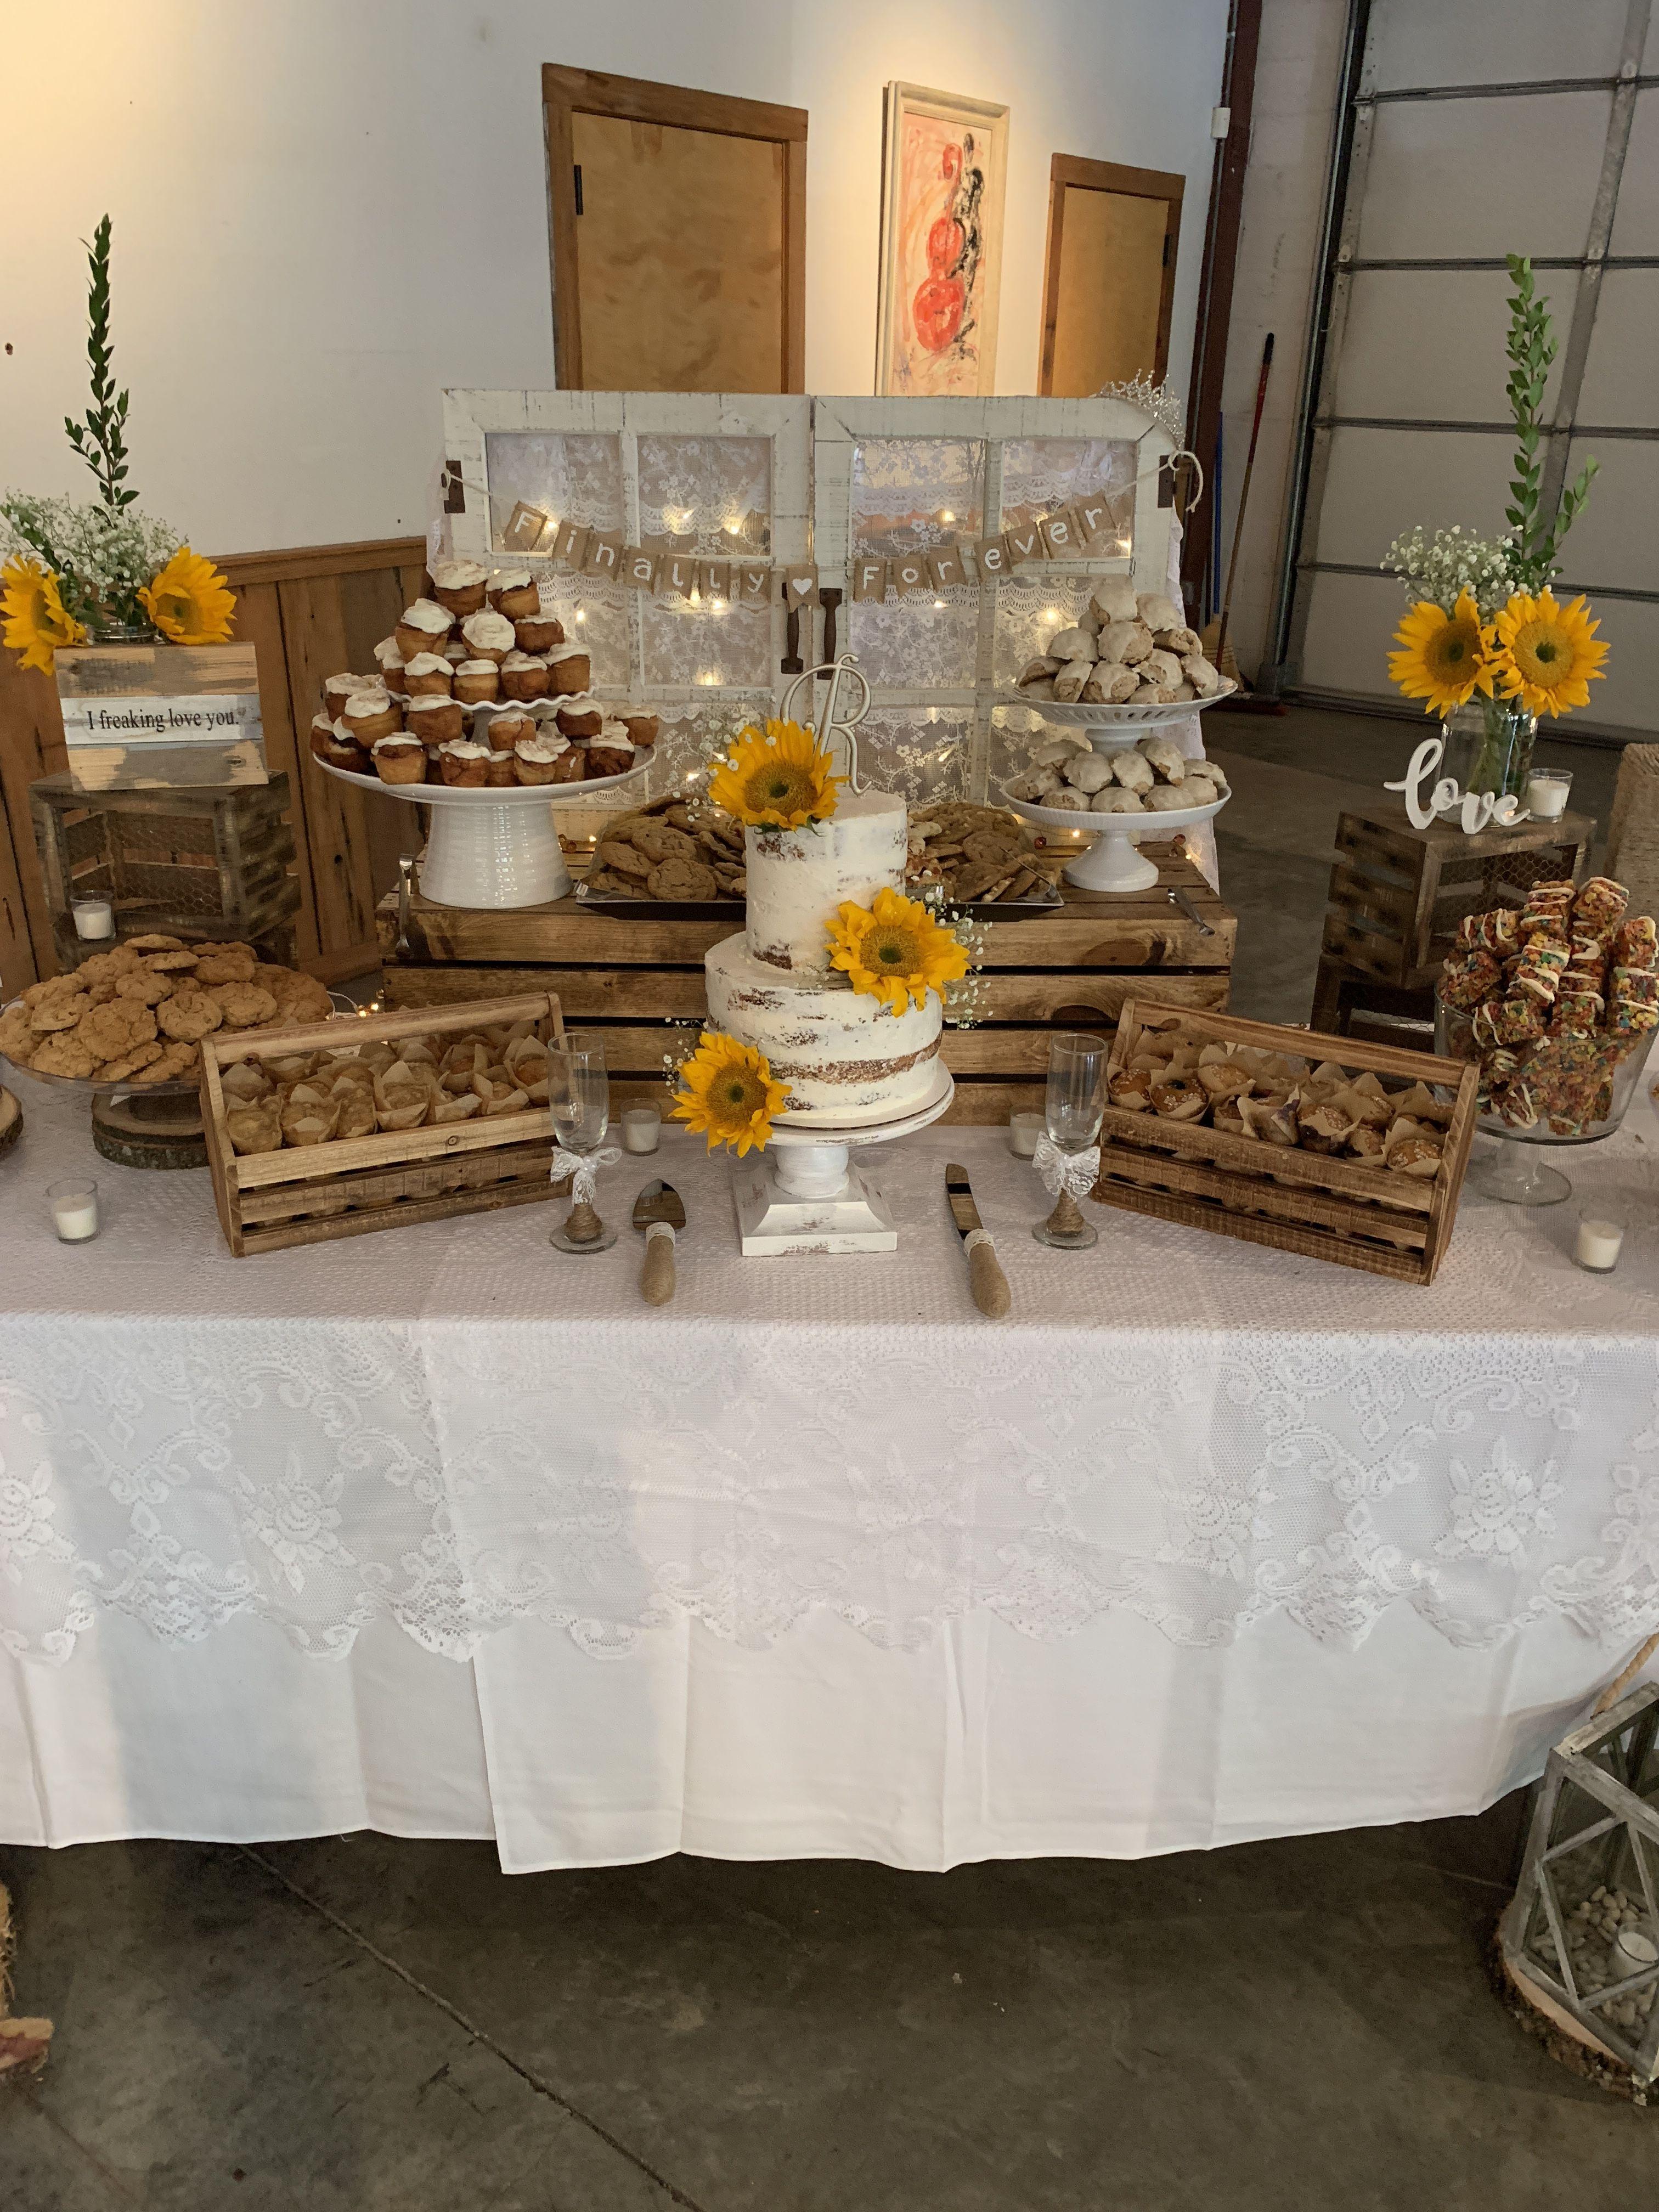 Rustic wedding dessert table with sunflowers Wedding